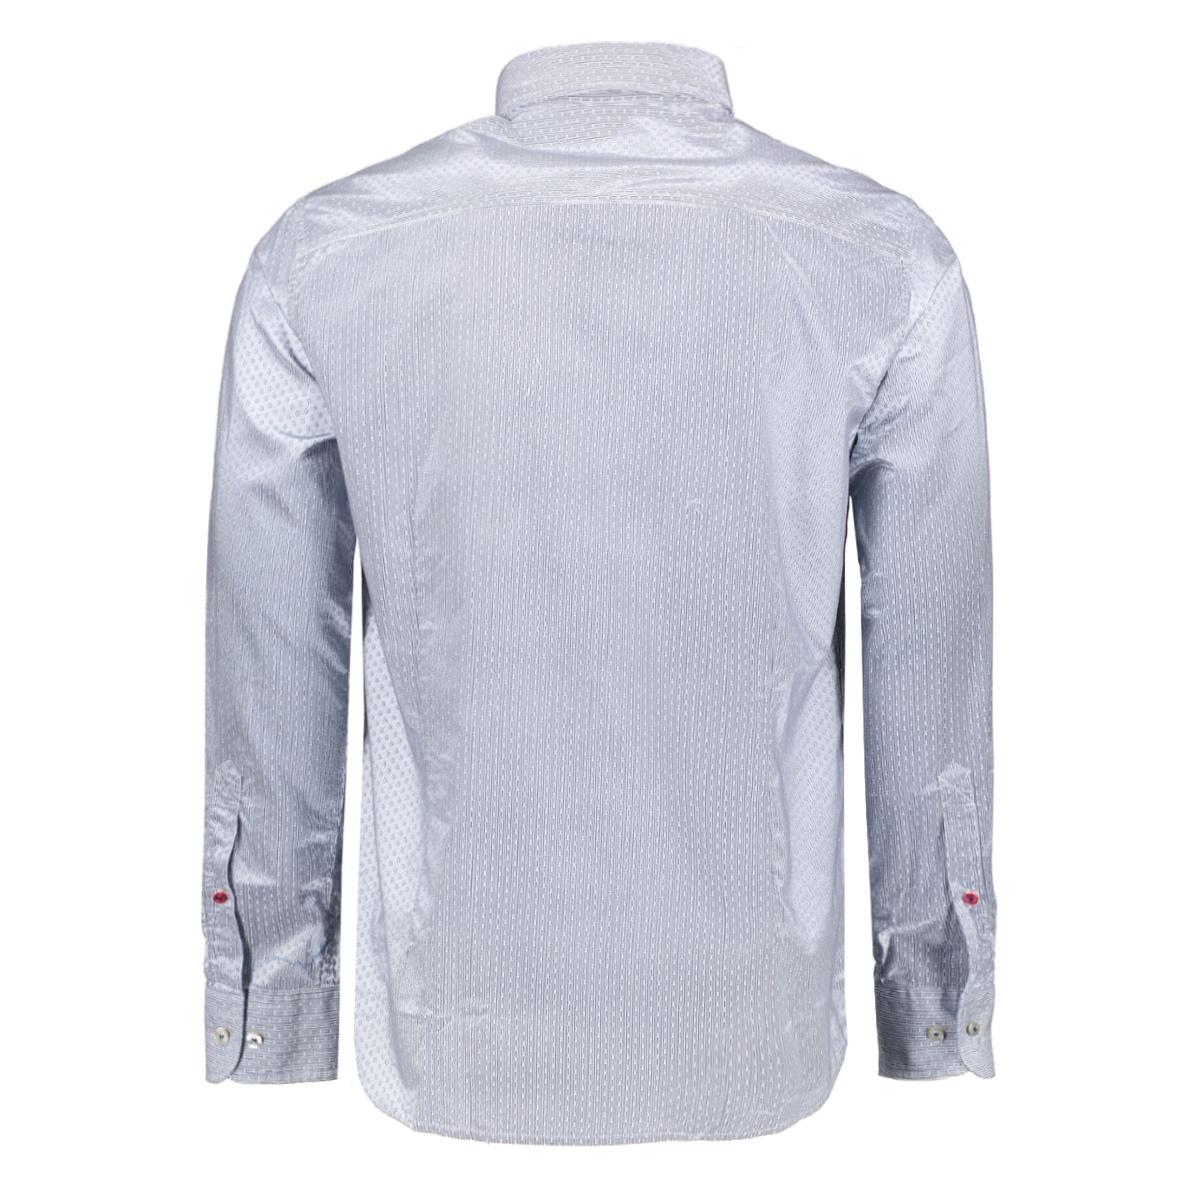 214-37002 bluefields overhemd 5357